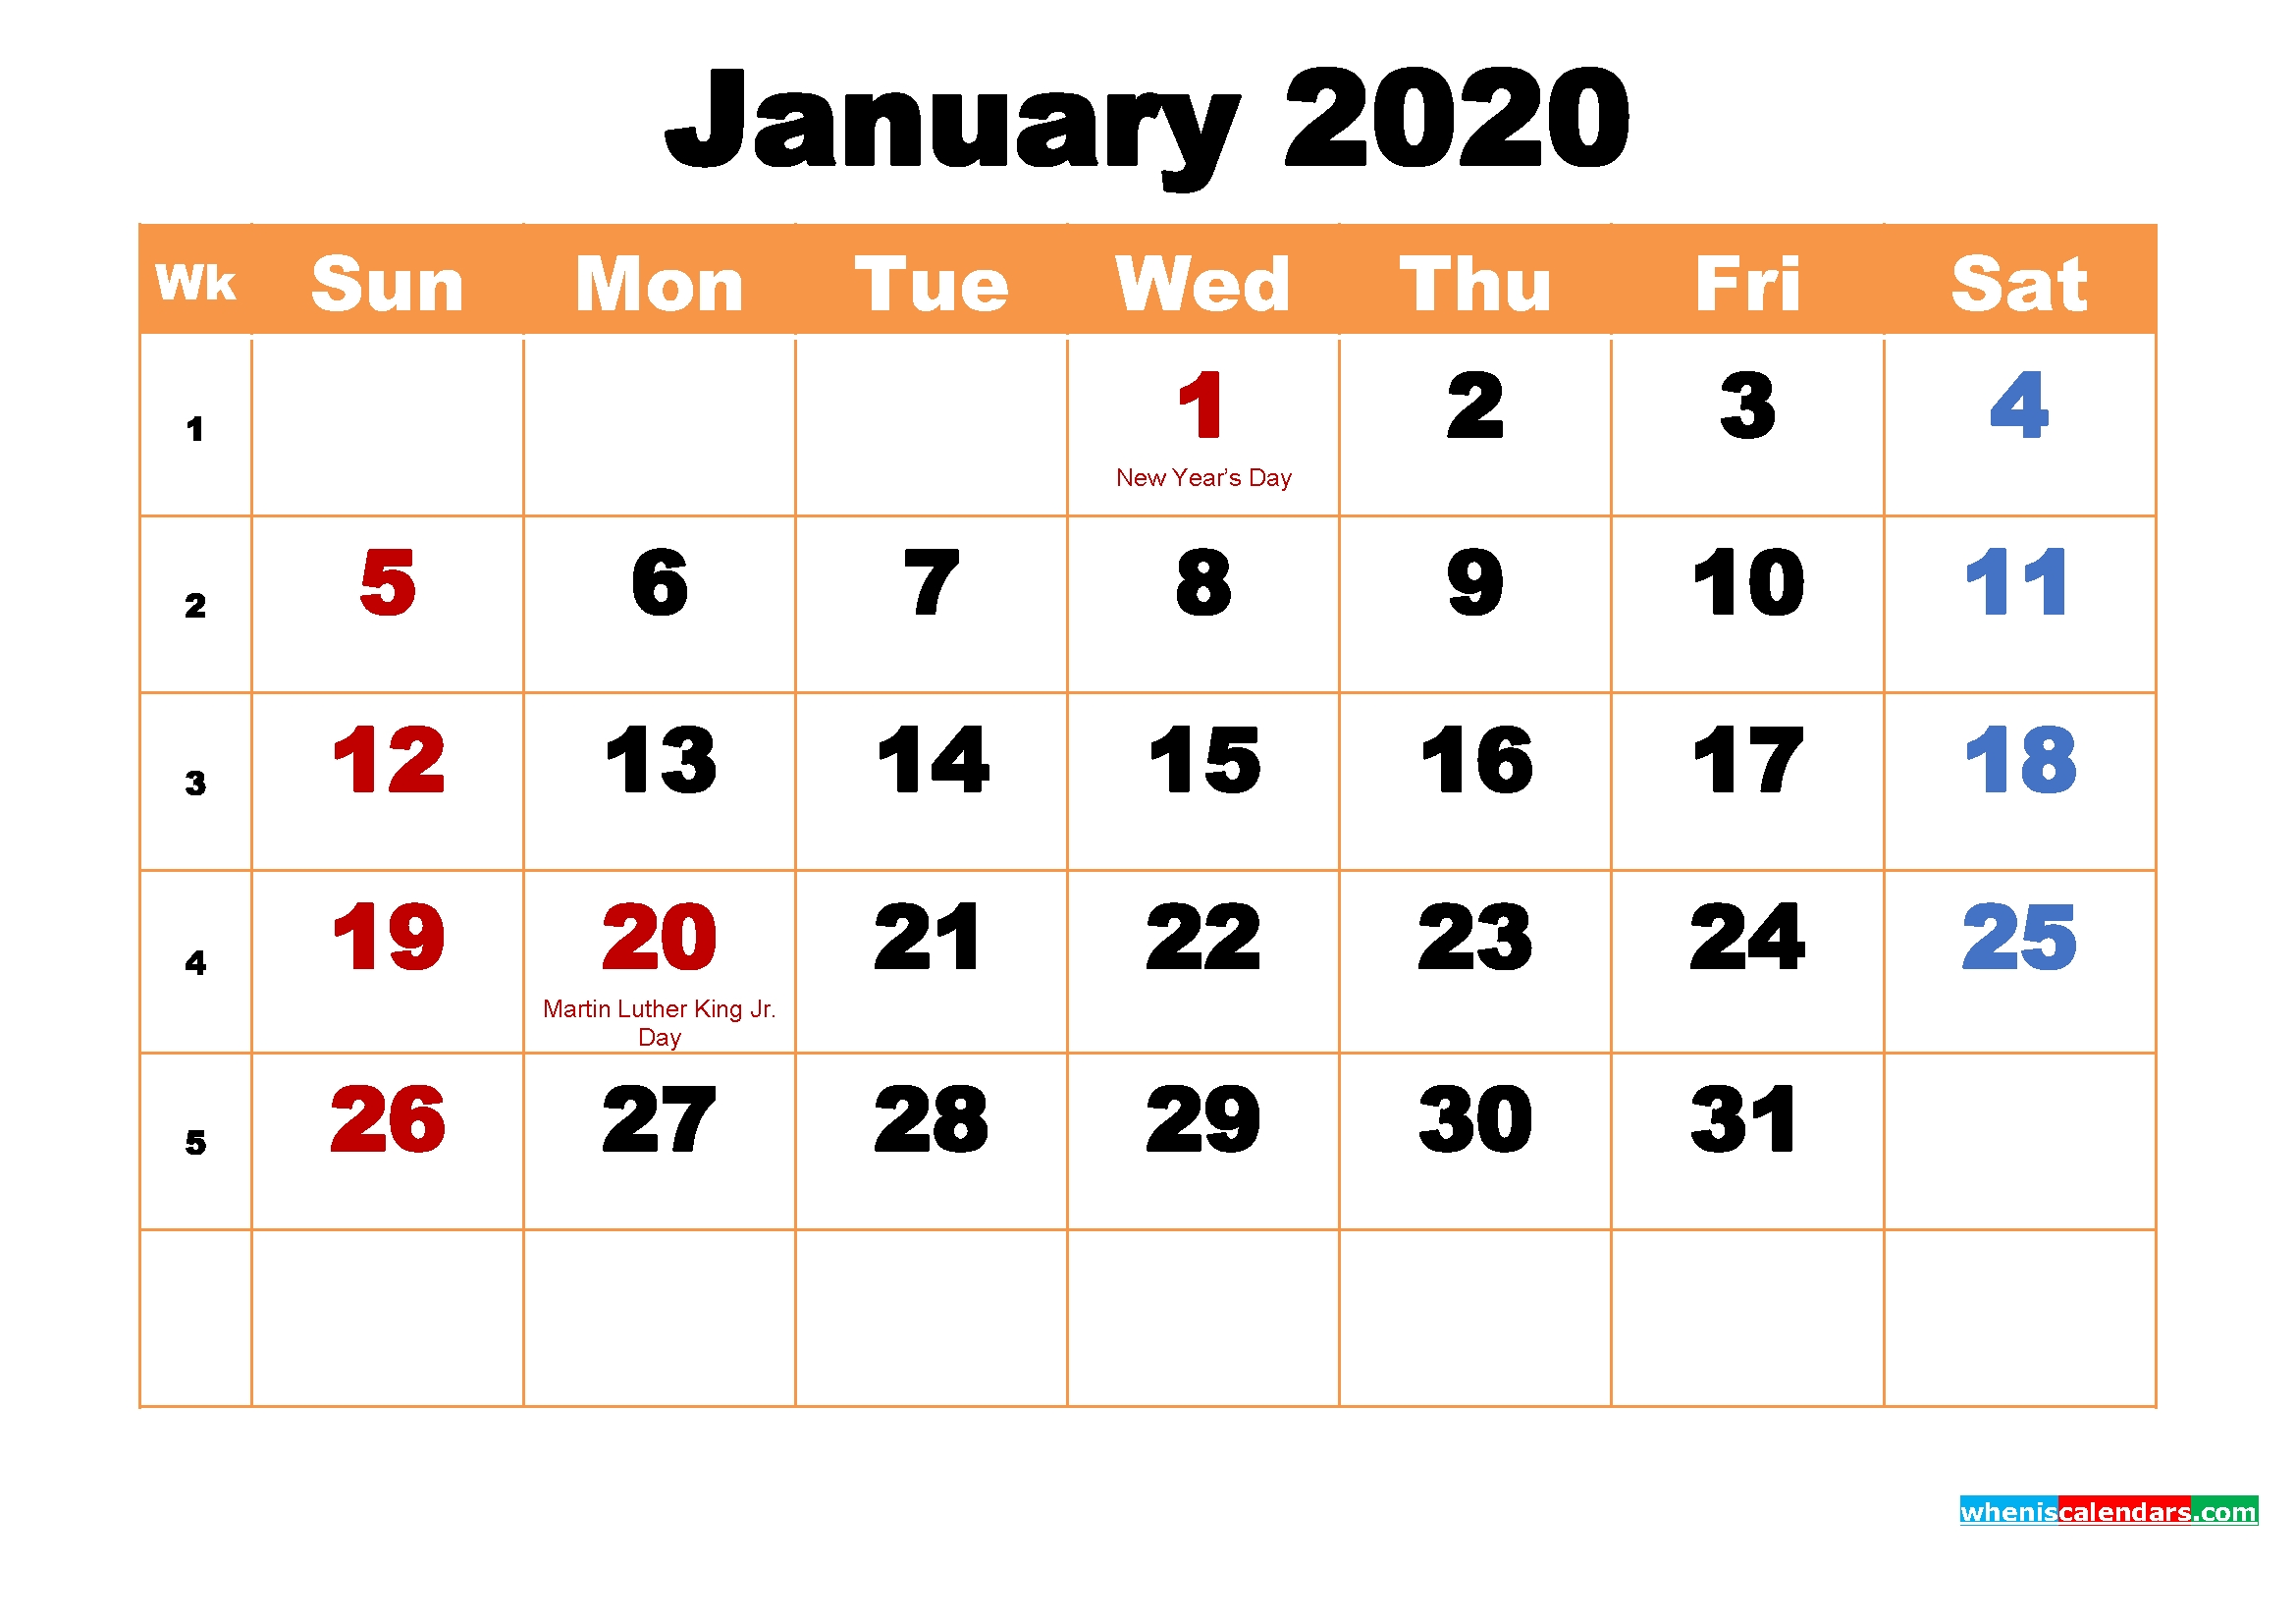 January 2020 Calendar Wallpaper High Resolution | Free